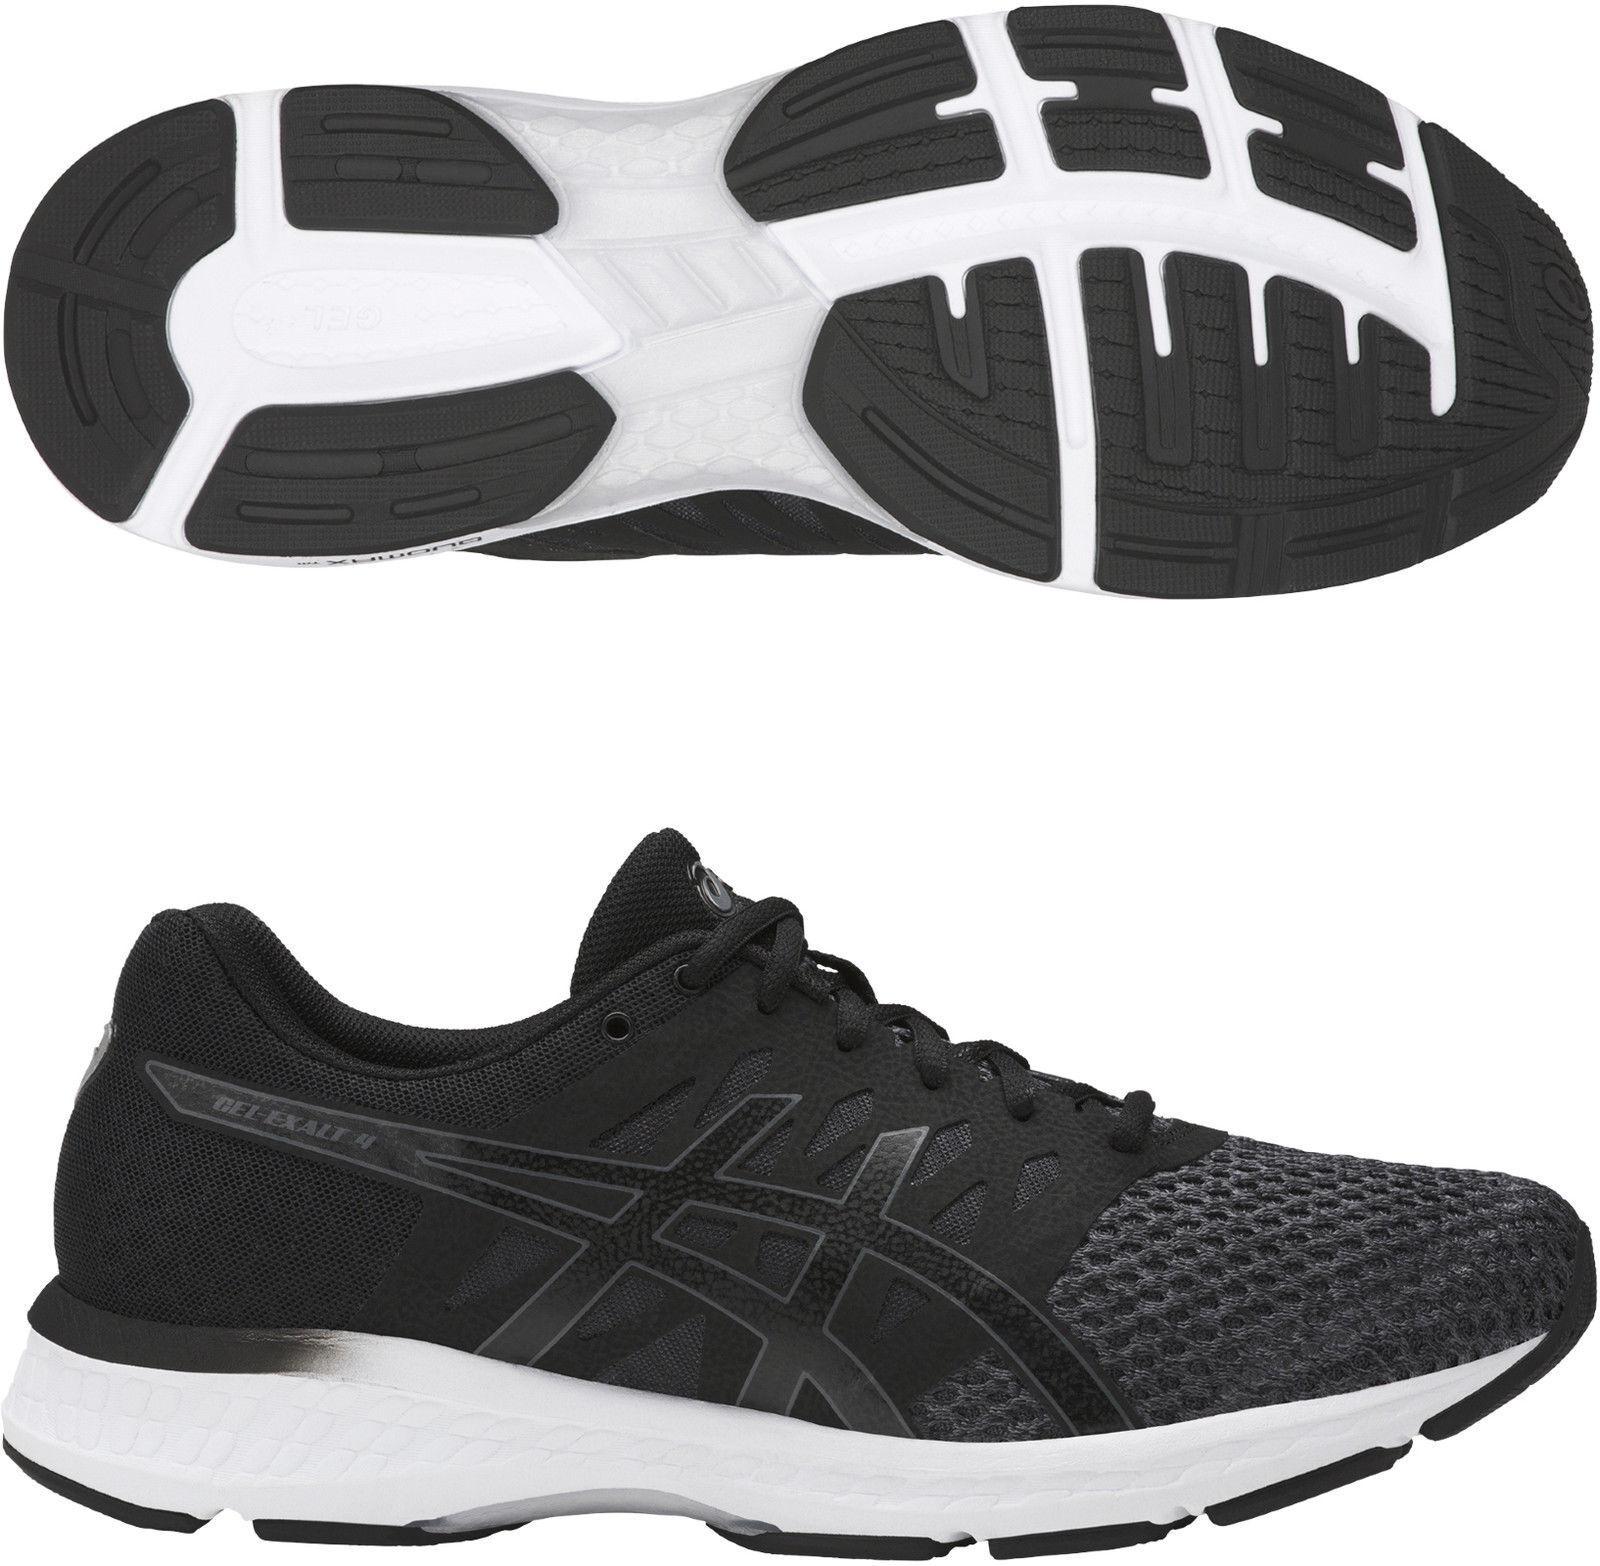 Asics Mens Gel Exalt 4 trainers shoes running jogging gym 5k 10 k runs